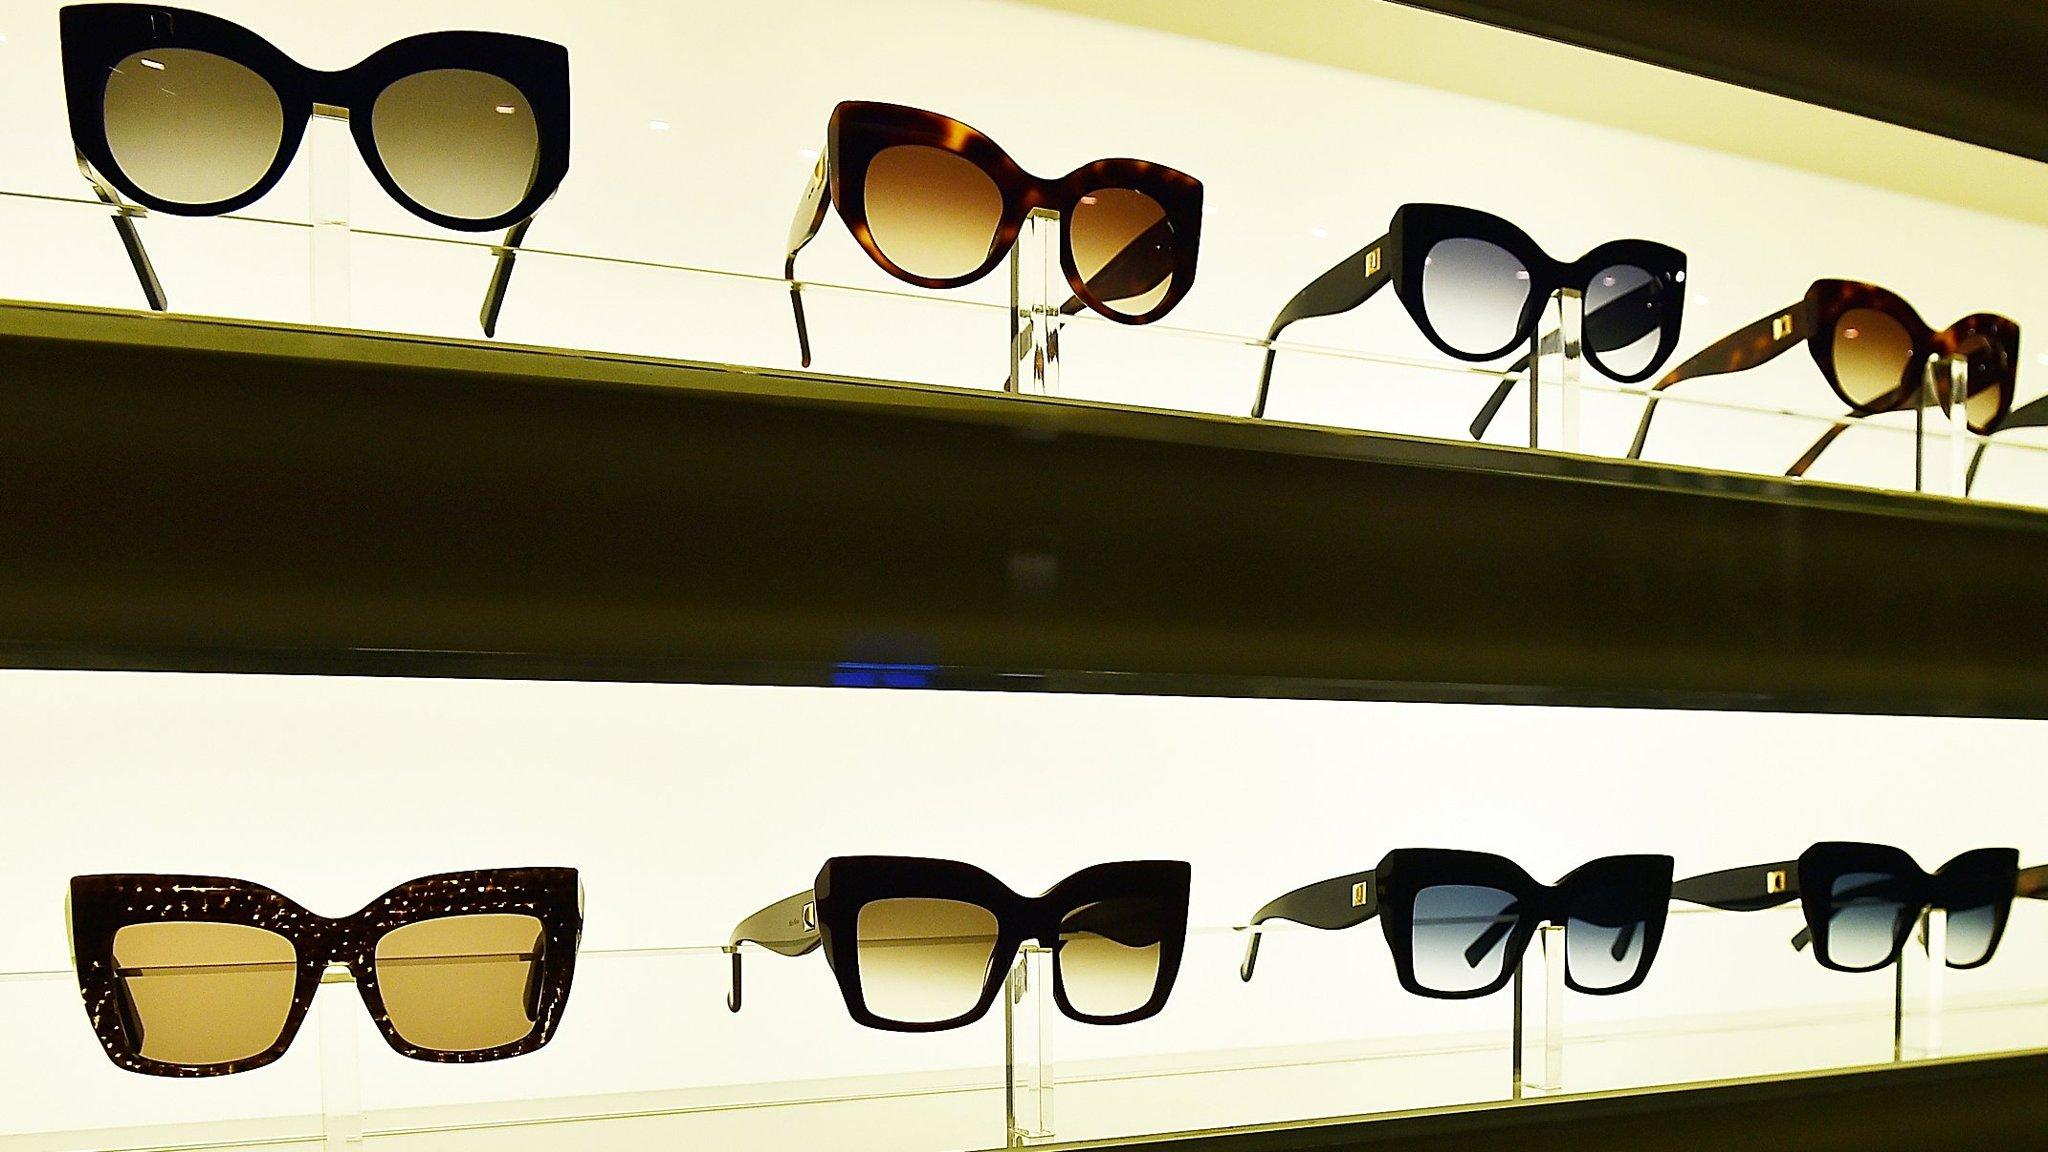 Luxury eyewear in the spotlight as brands focus in on sector ...